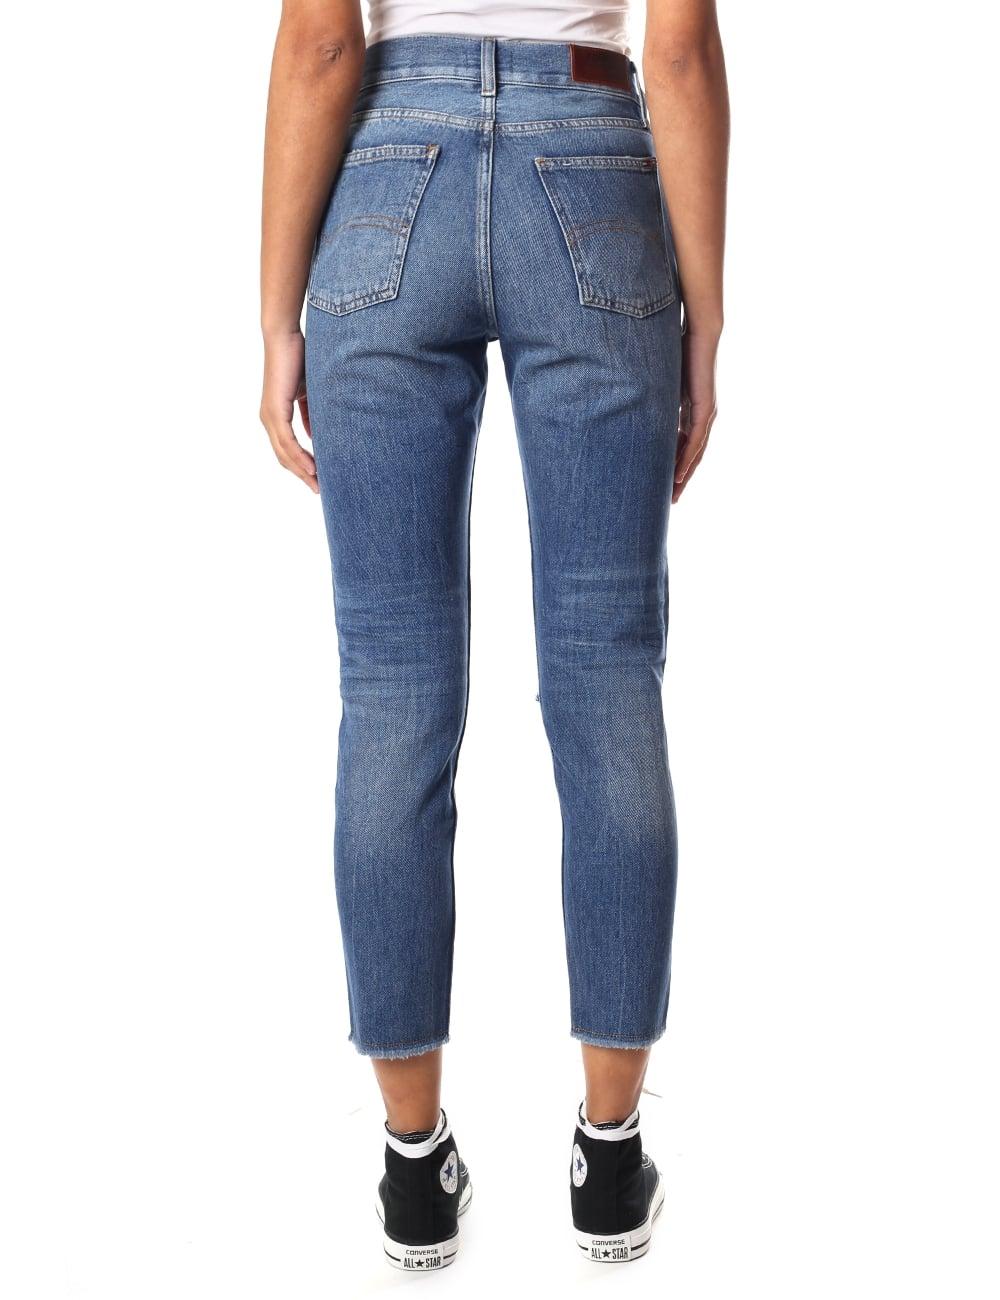 5bd87501 Tommy Hilfiger Skinny Women's High Rise Jean